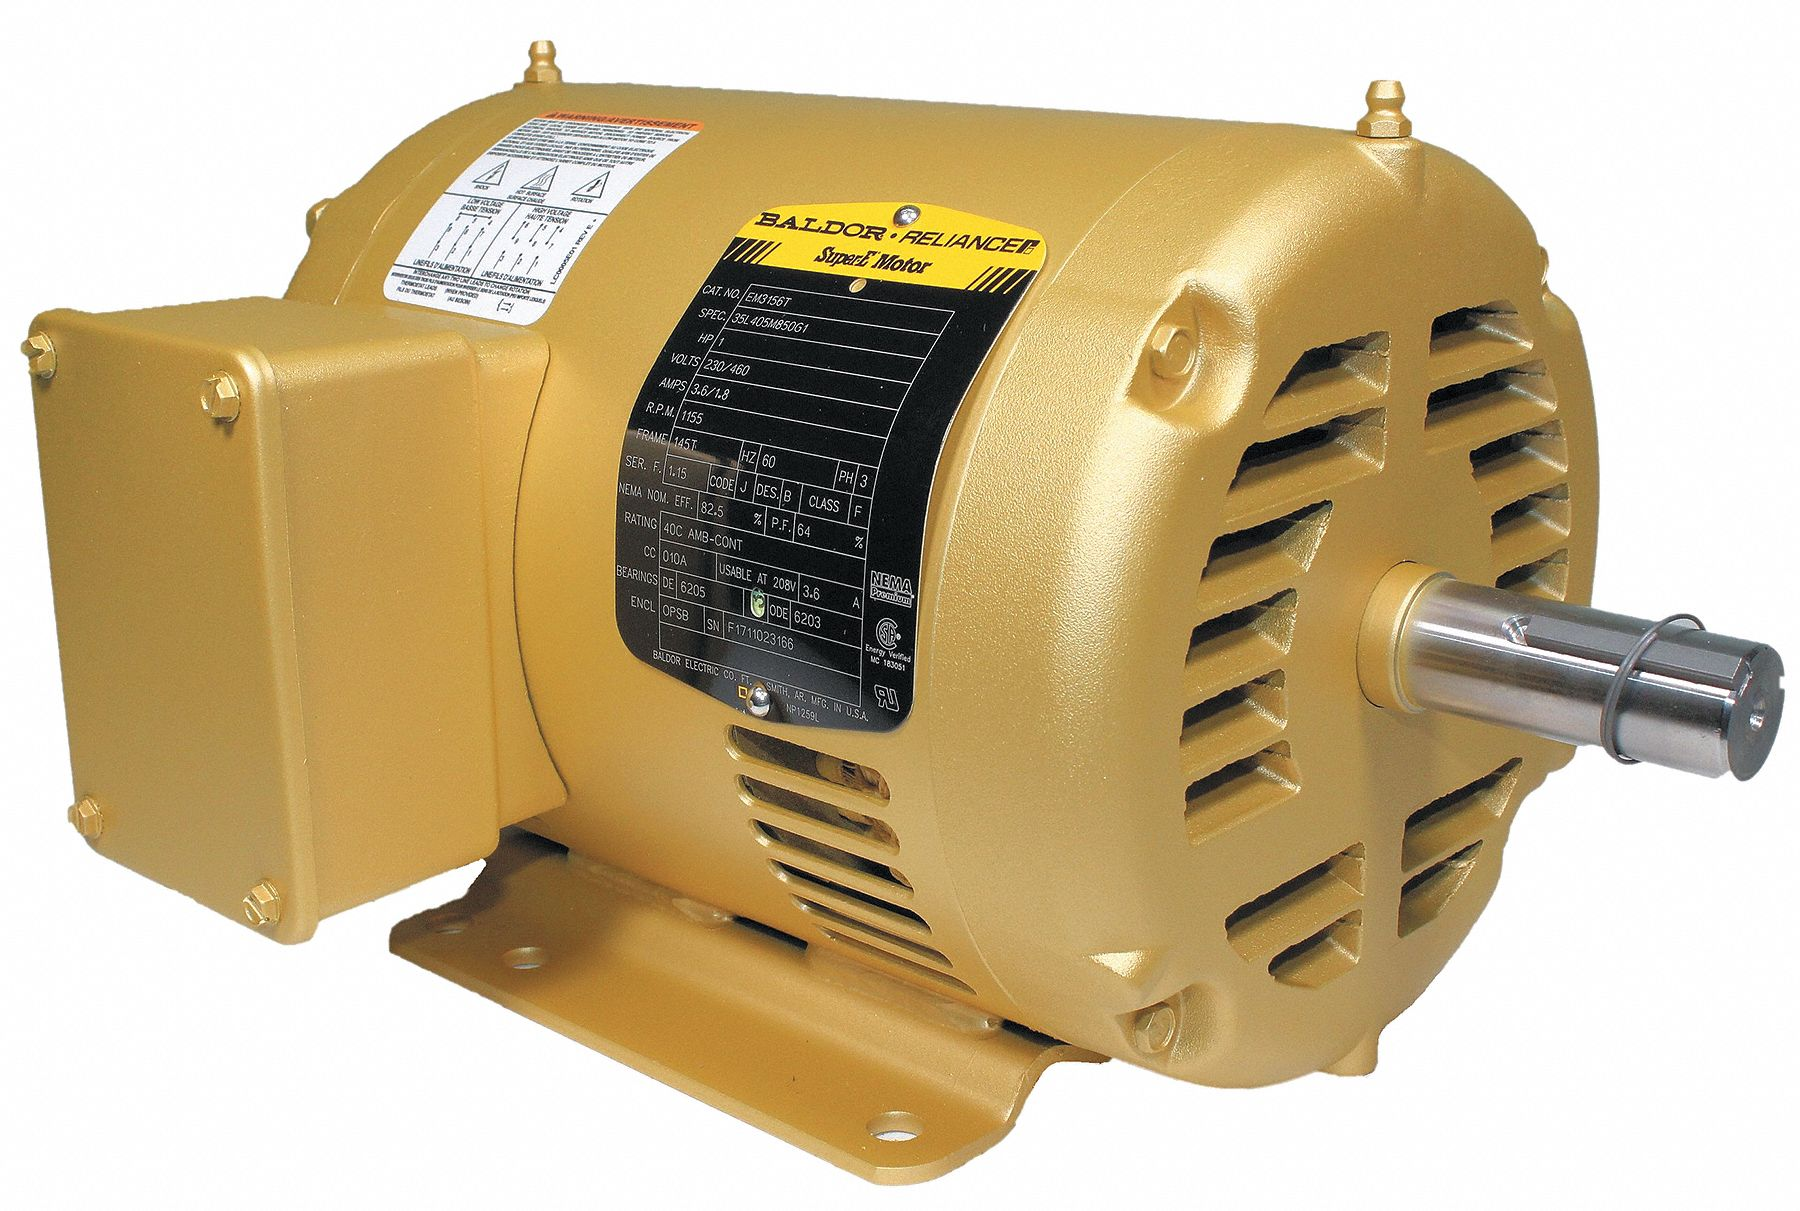 Baldor Electric Motor 3 Ph 1 Hp 1155 Rpm 145t Odp 39e427